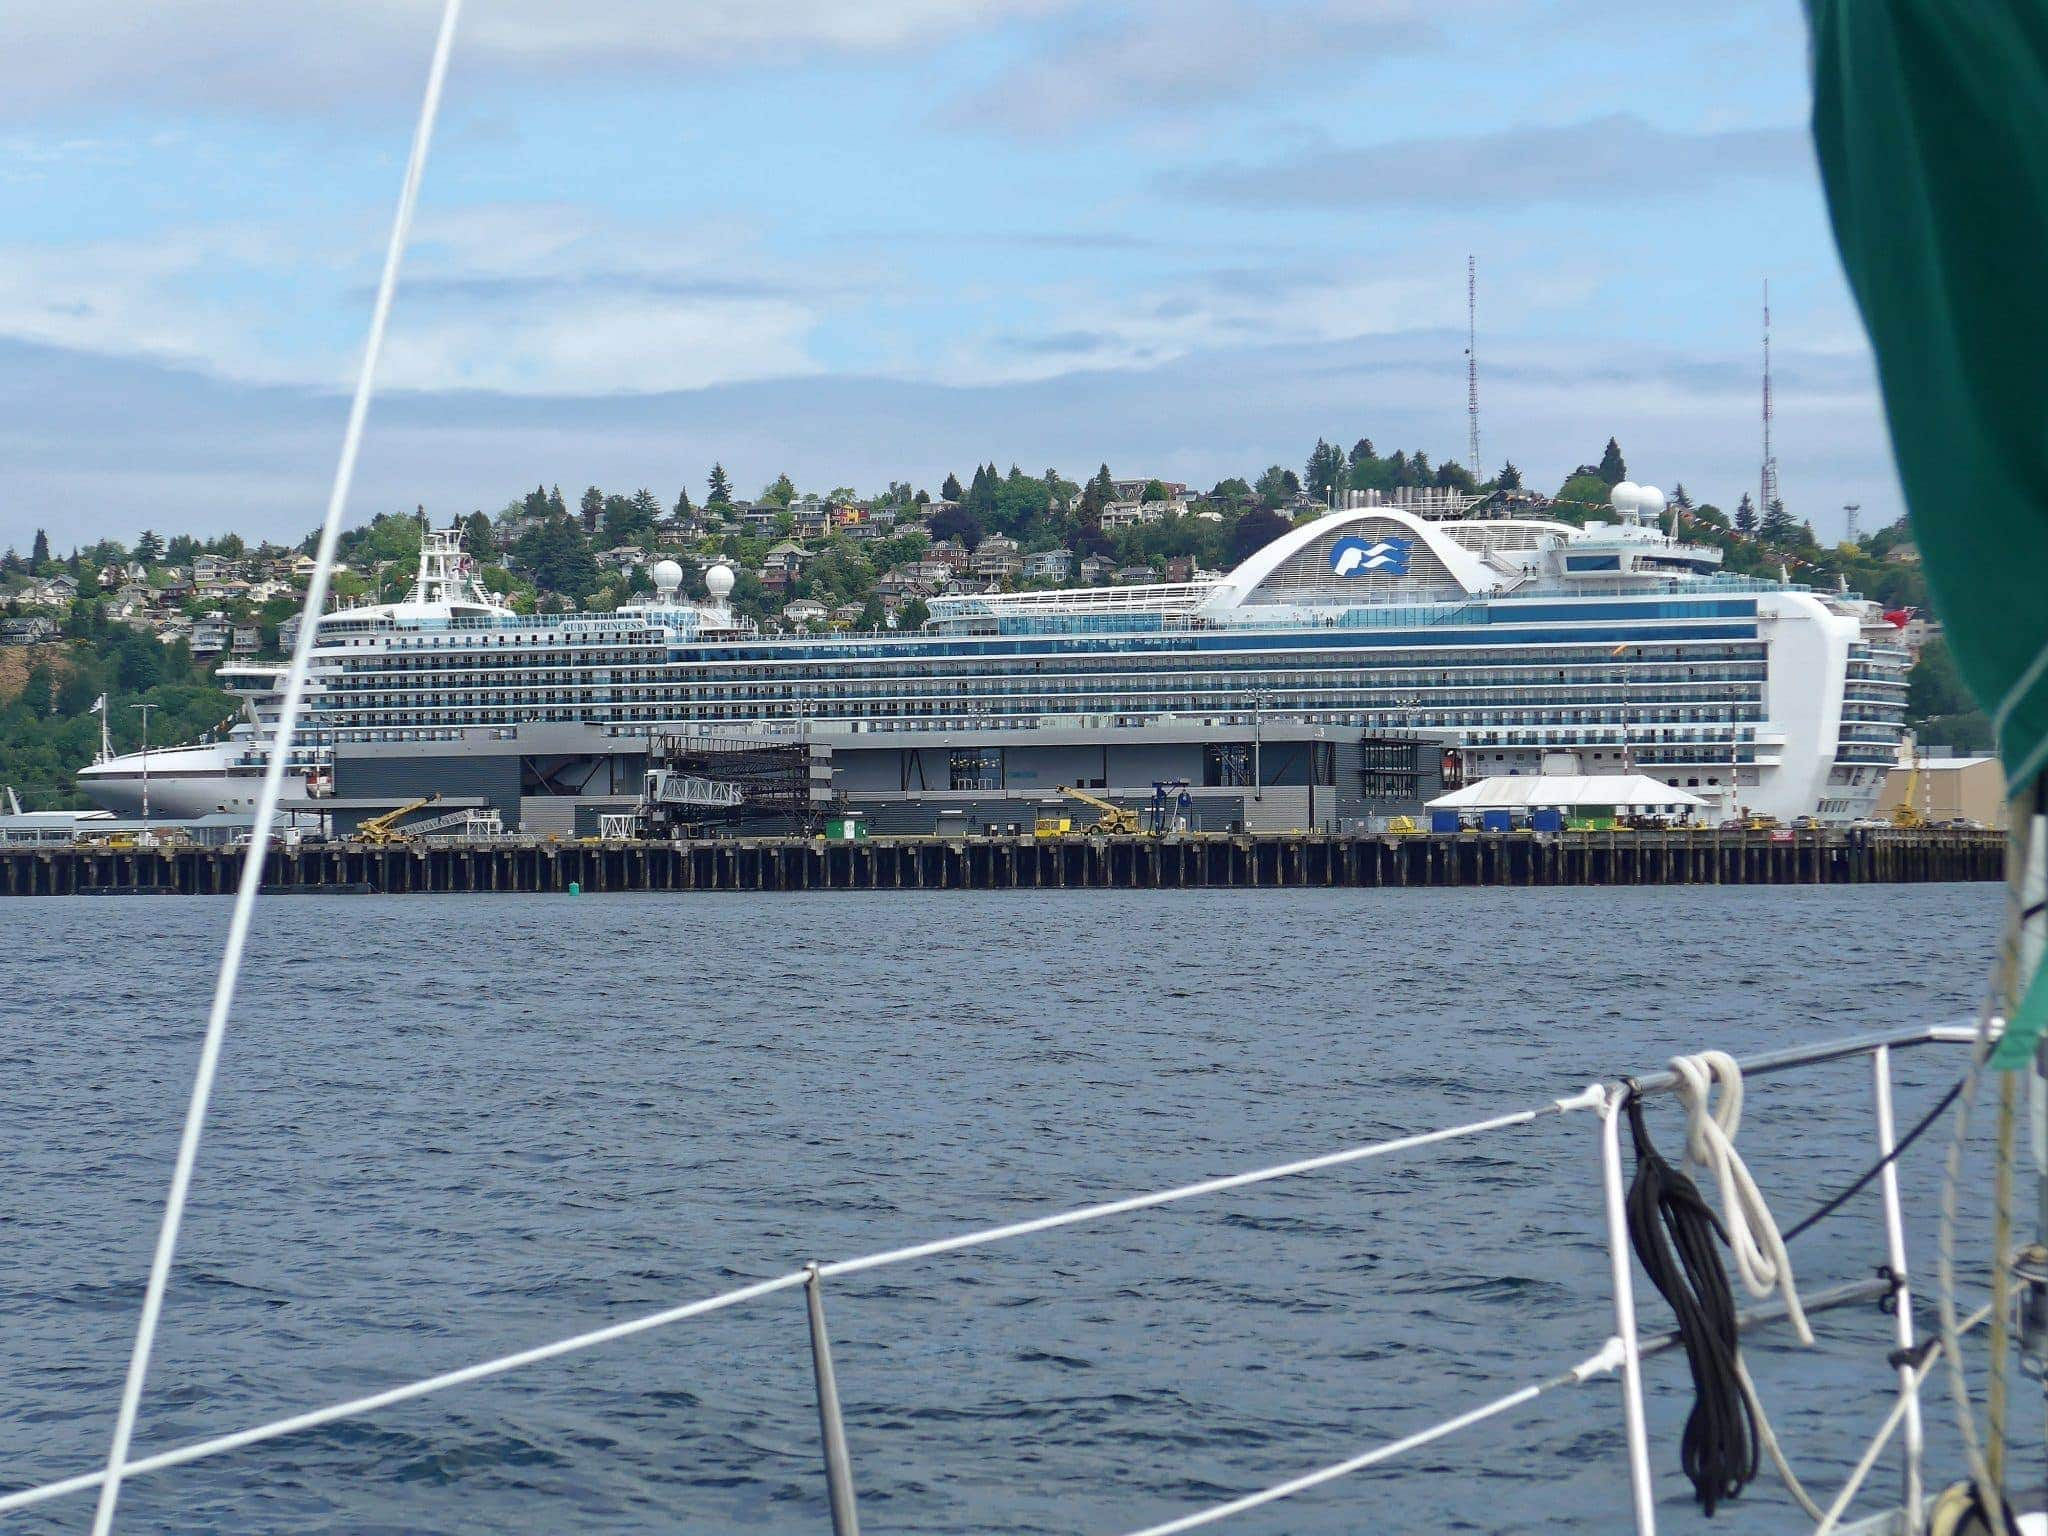 Cruise ships back already at Elliott Bay?